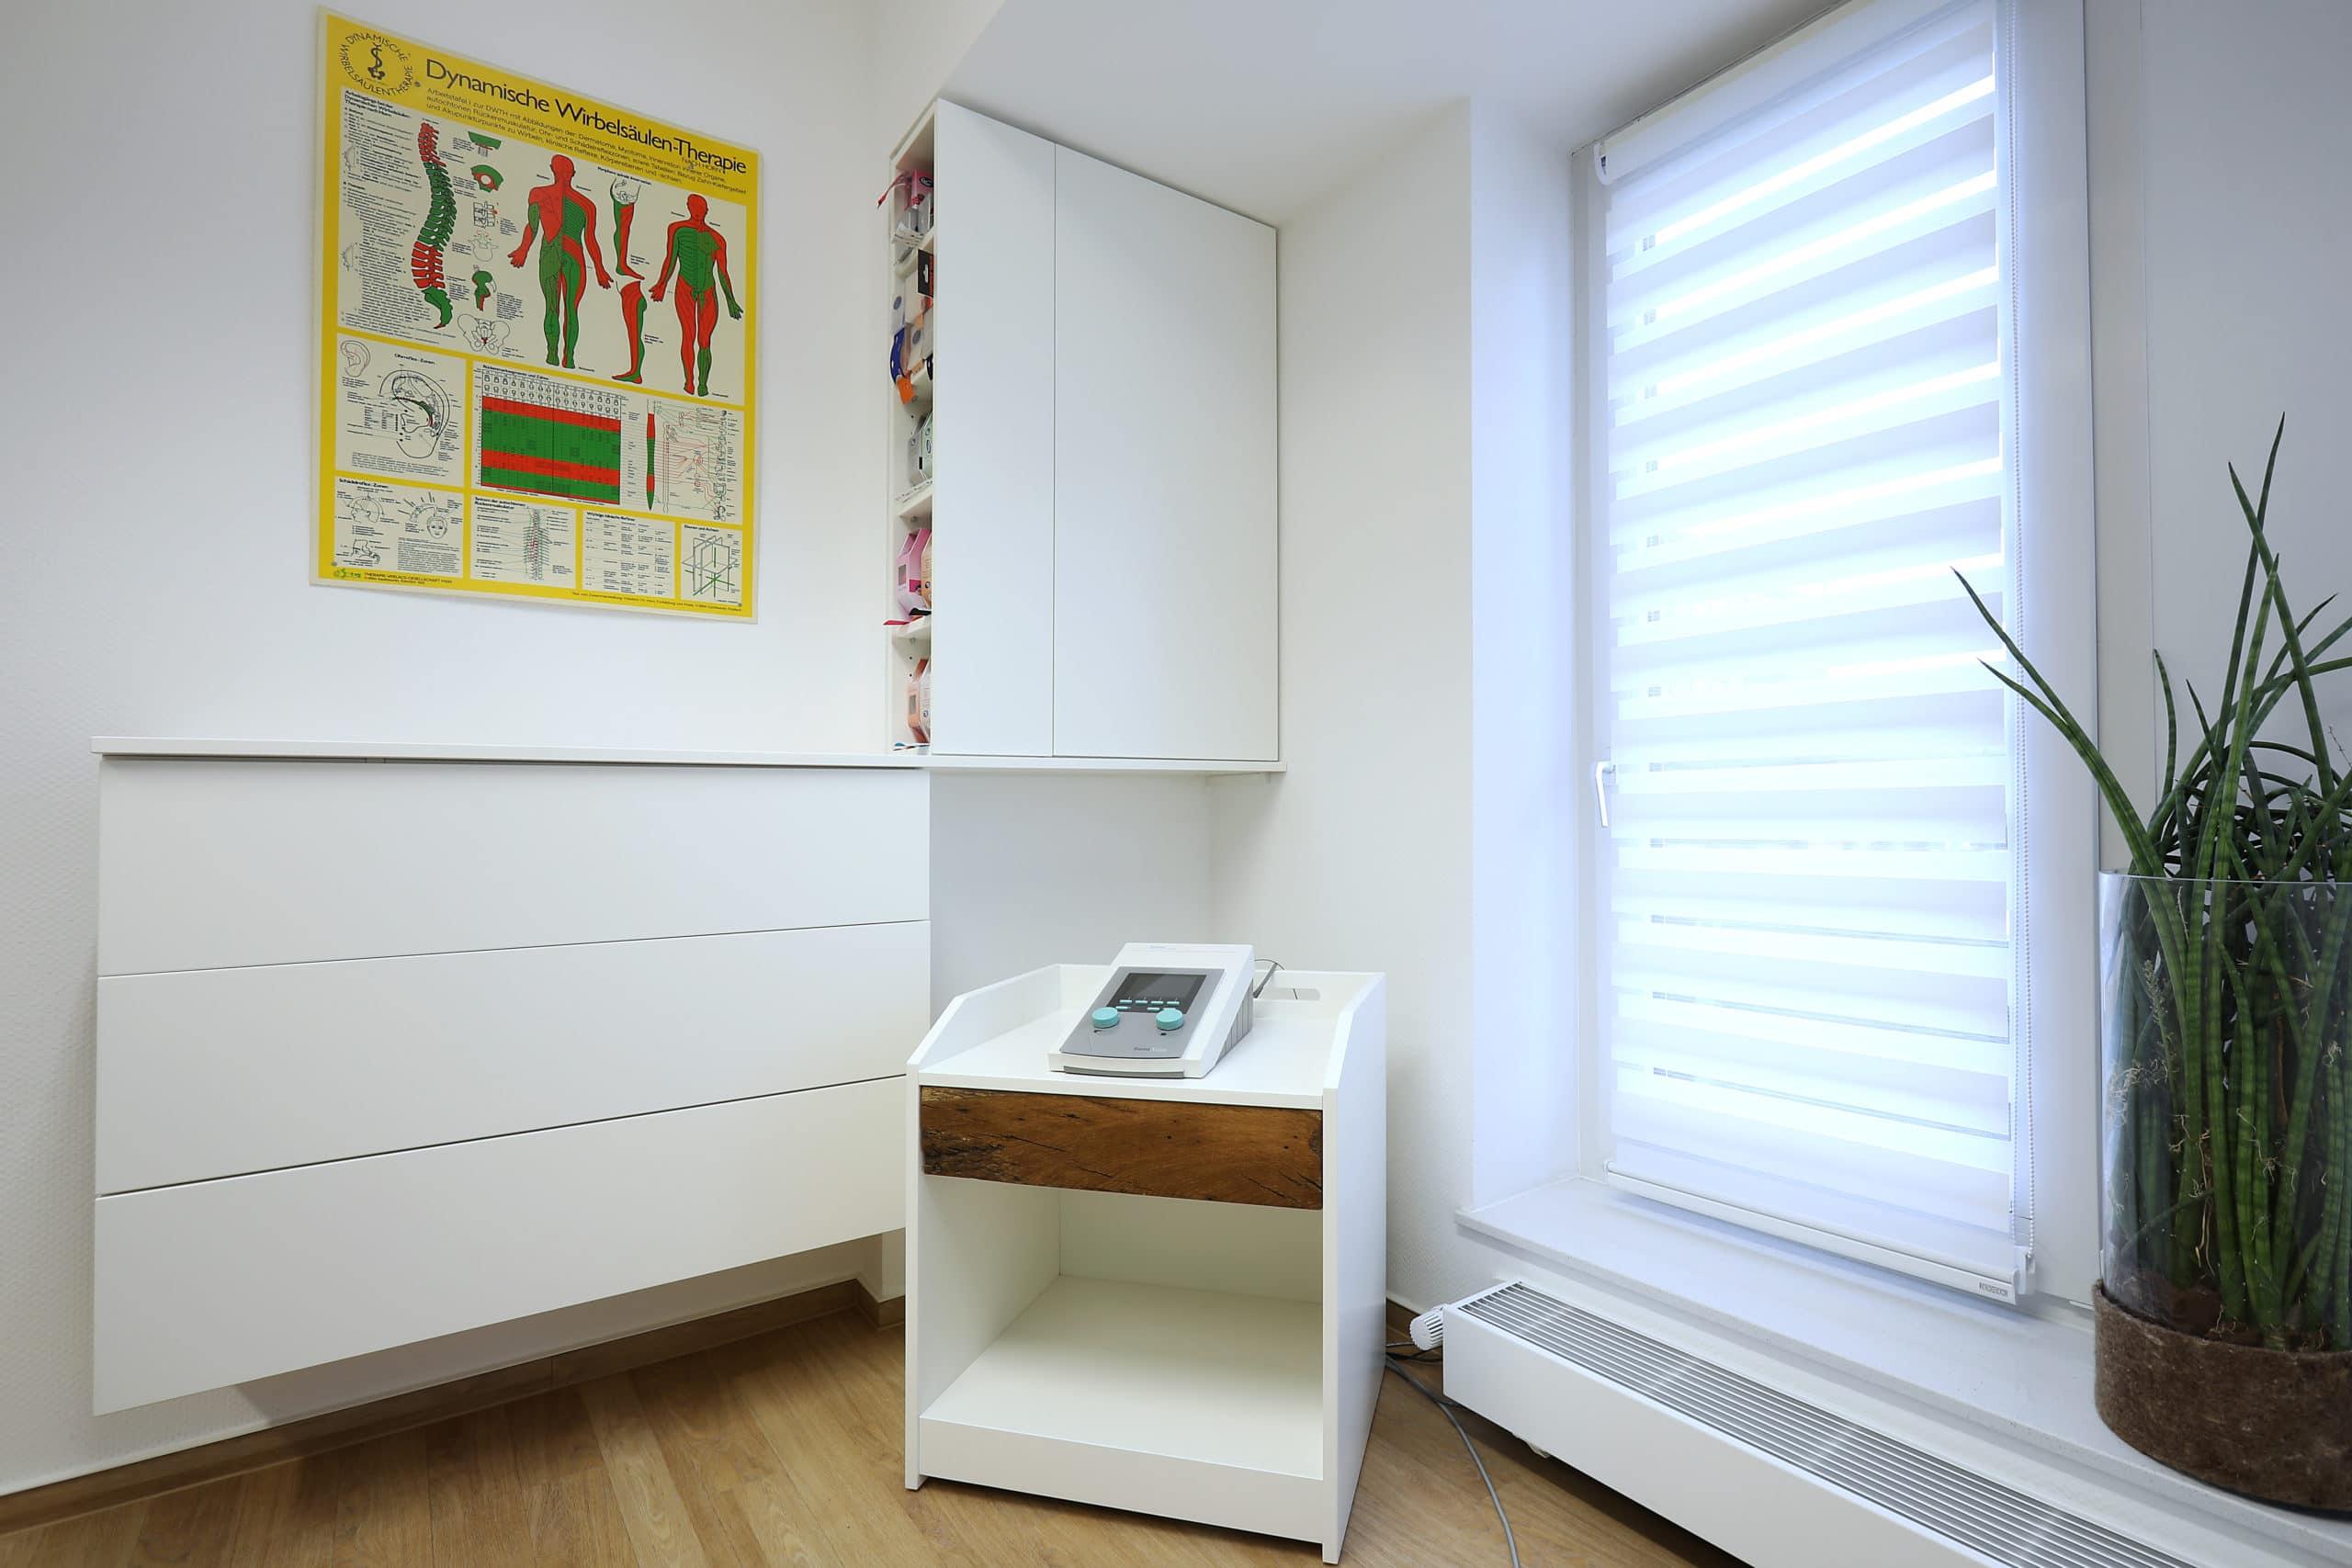 Praxiszentrum Heilpraktiker, Solingen